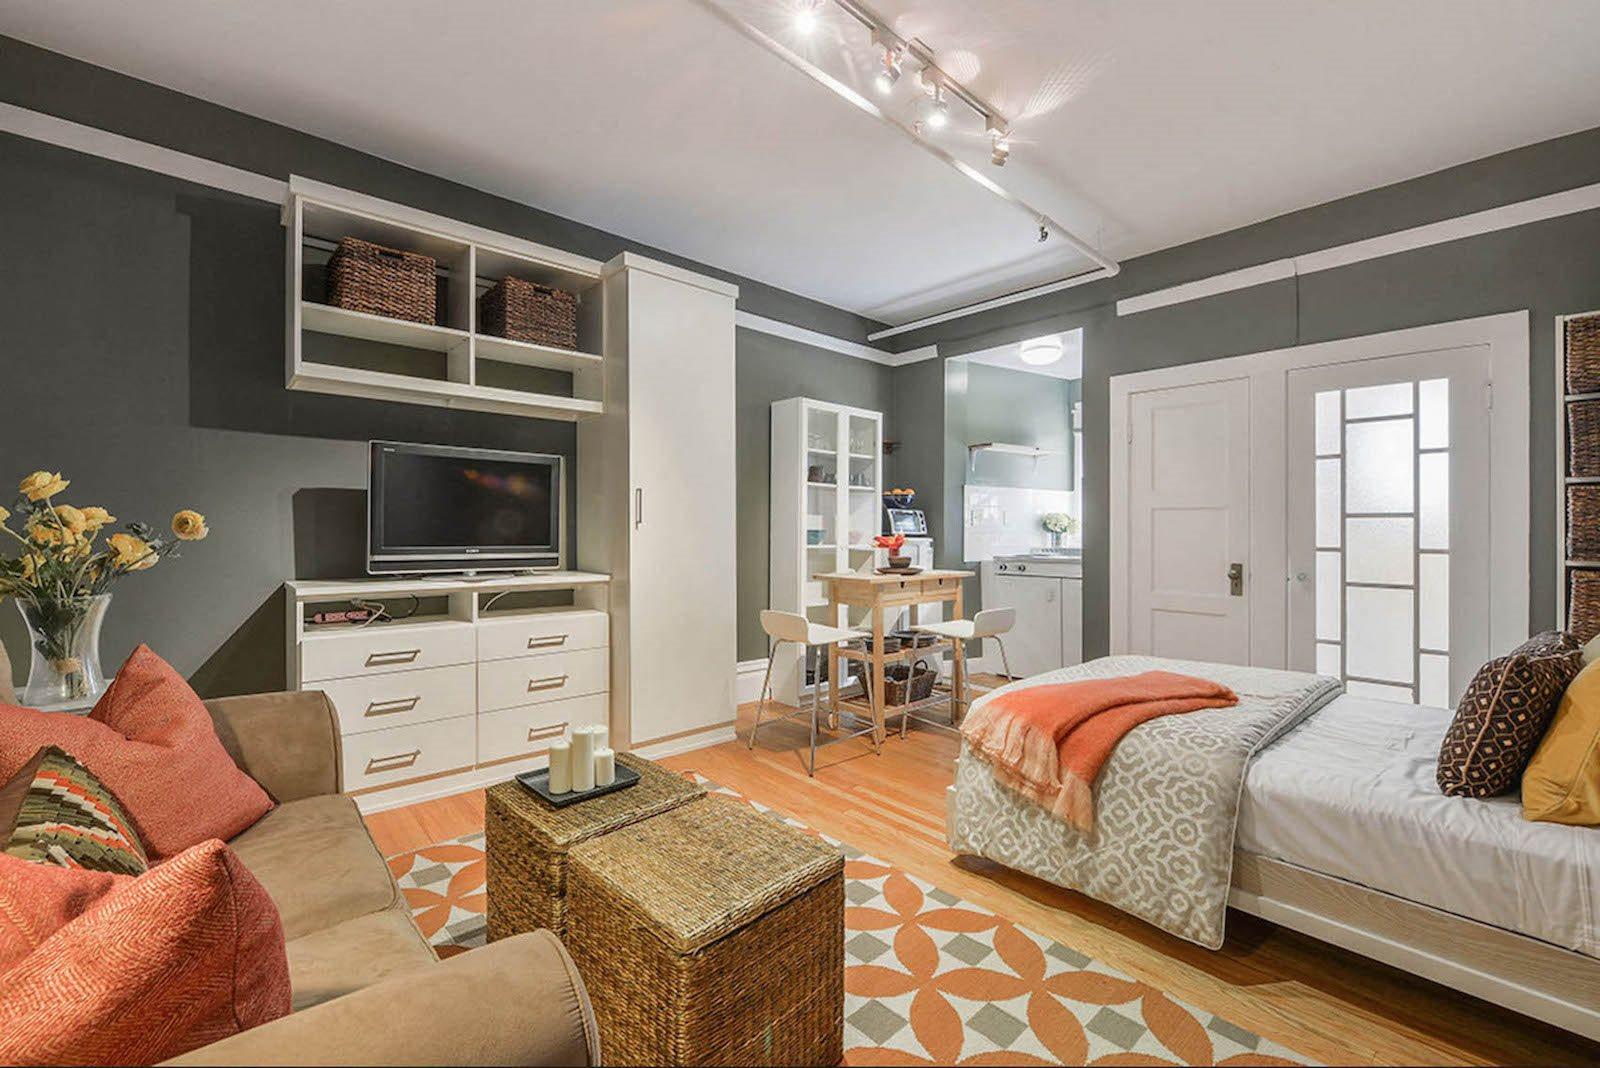 2730 SACRAMENTO Apartments homepagegallery 5